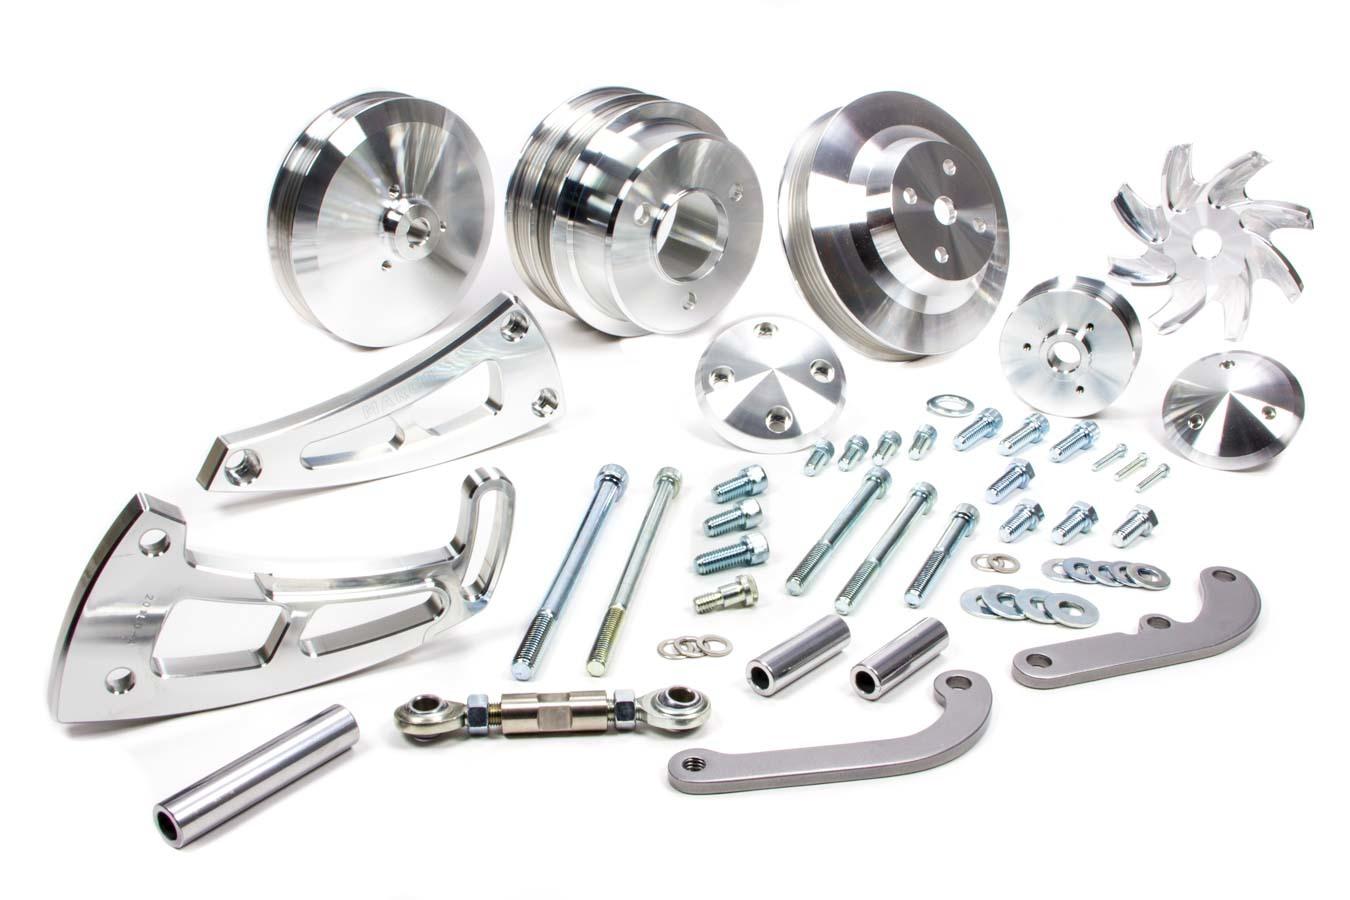 March 23020 Pulley Kit, Ultra, Performance, 6 Rib Serpentine, Aluminum, Clear Powder Coat, Long Water Pump, Big Block Chevy, Kit